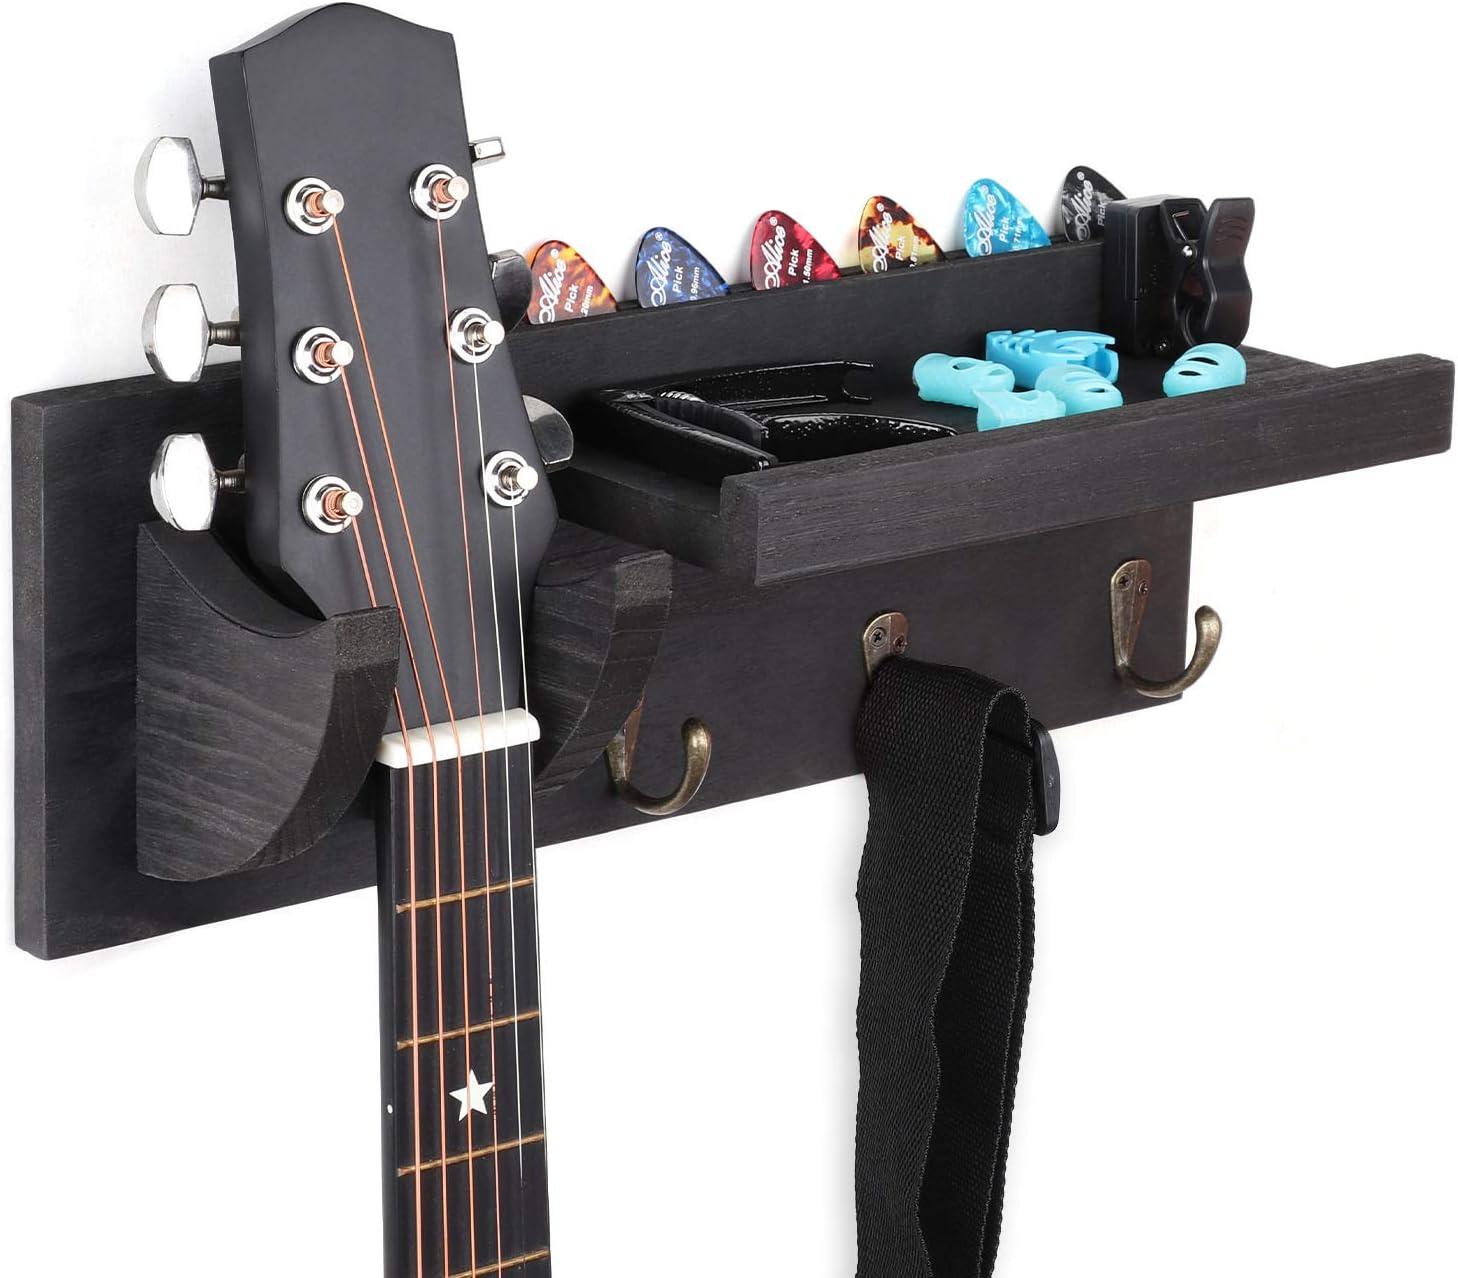 Bikoney Guitar Wall Hanger Bracket Hang Louisville-Jefferson County Mall Holder Mount Max 42% OFF